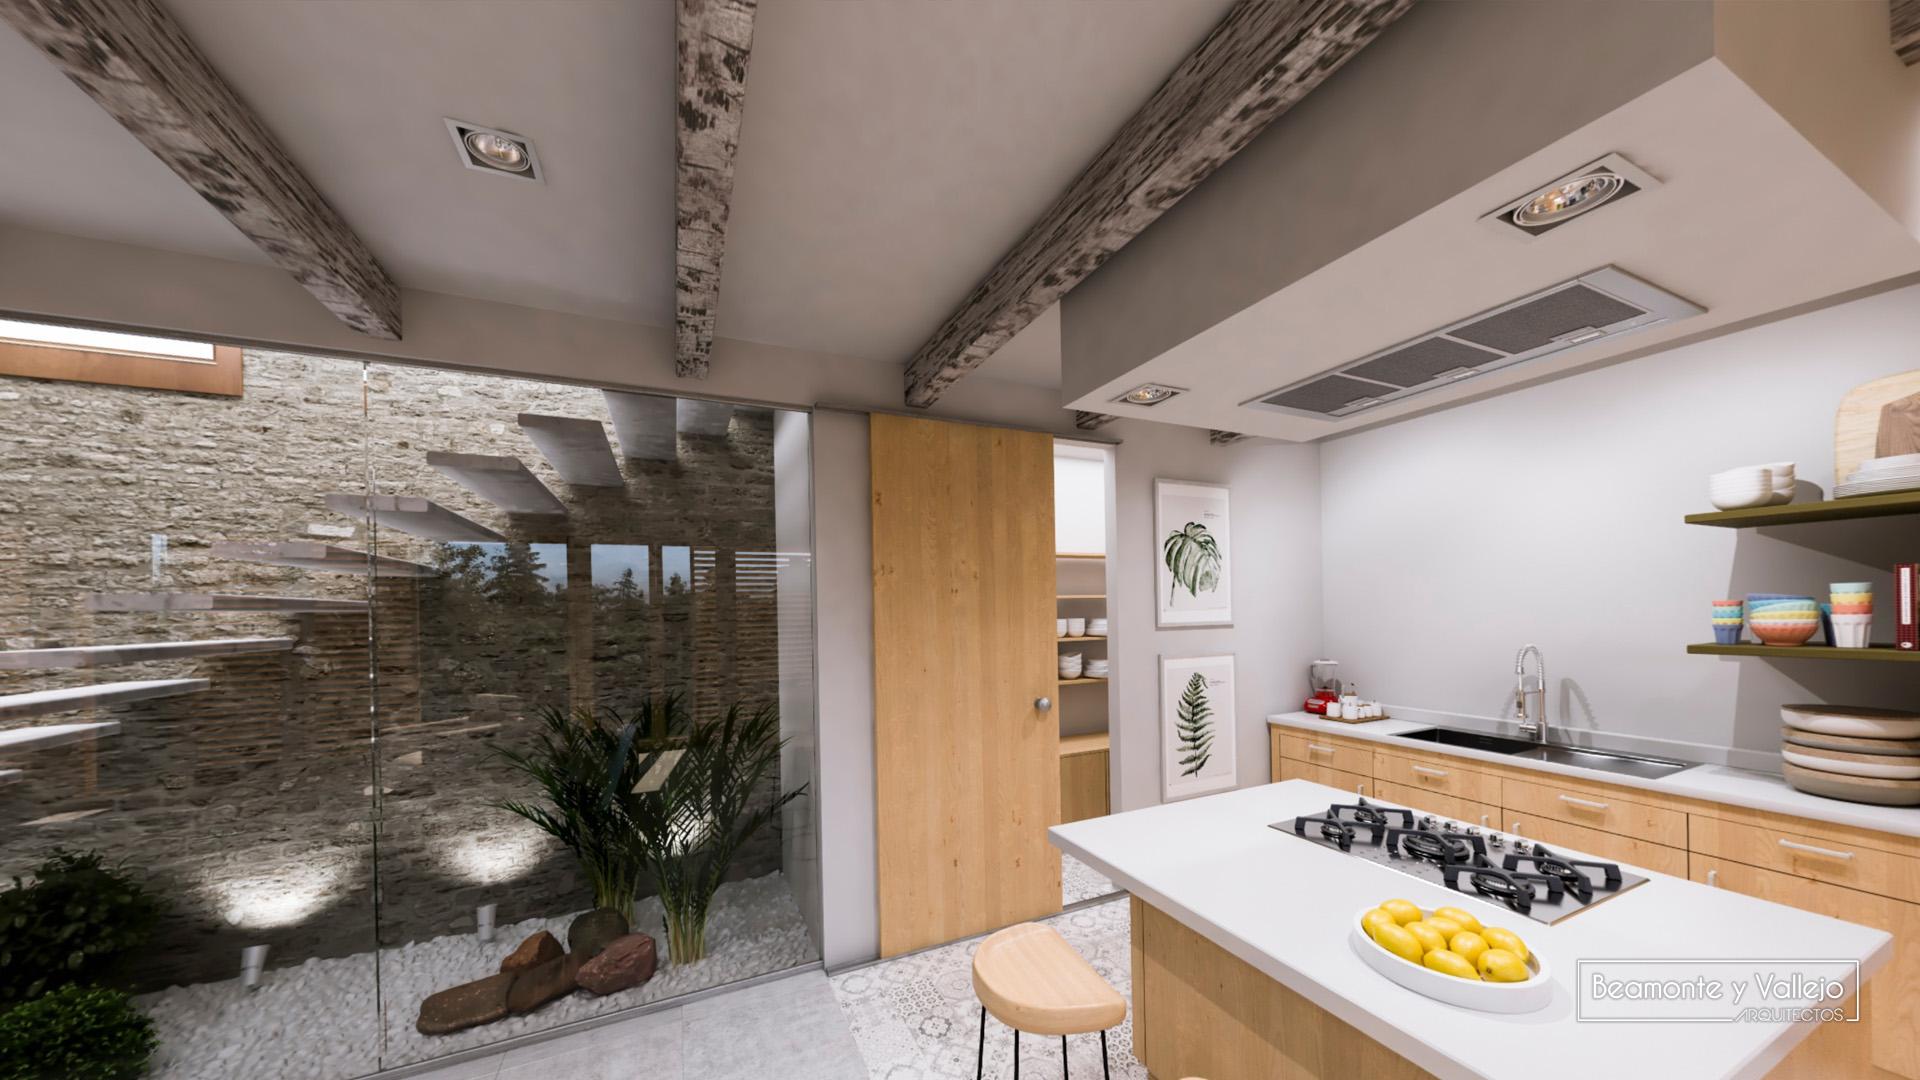 Beamonte y Vallejo arquitectos - Passivhaus Buera - 3